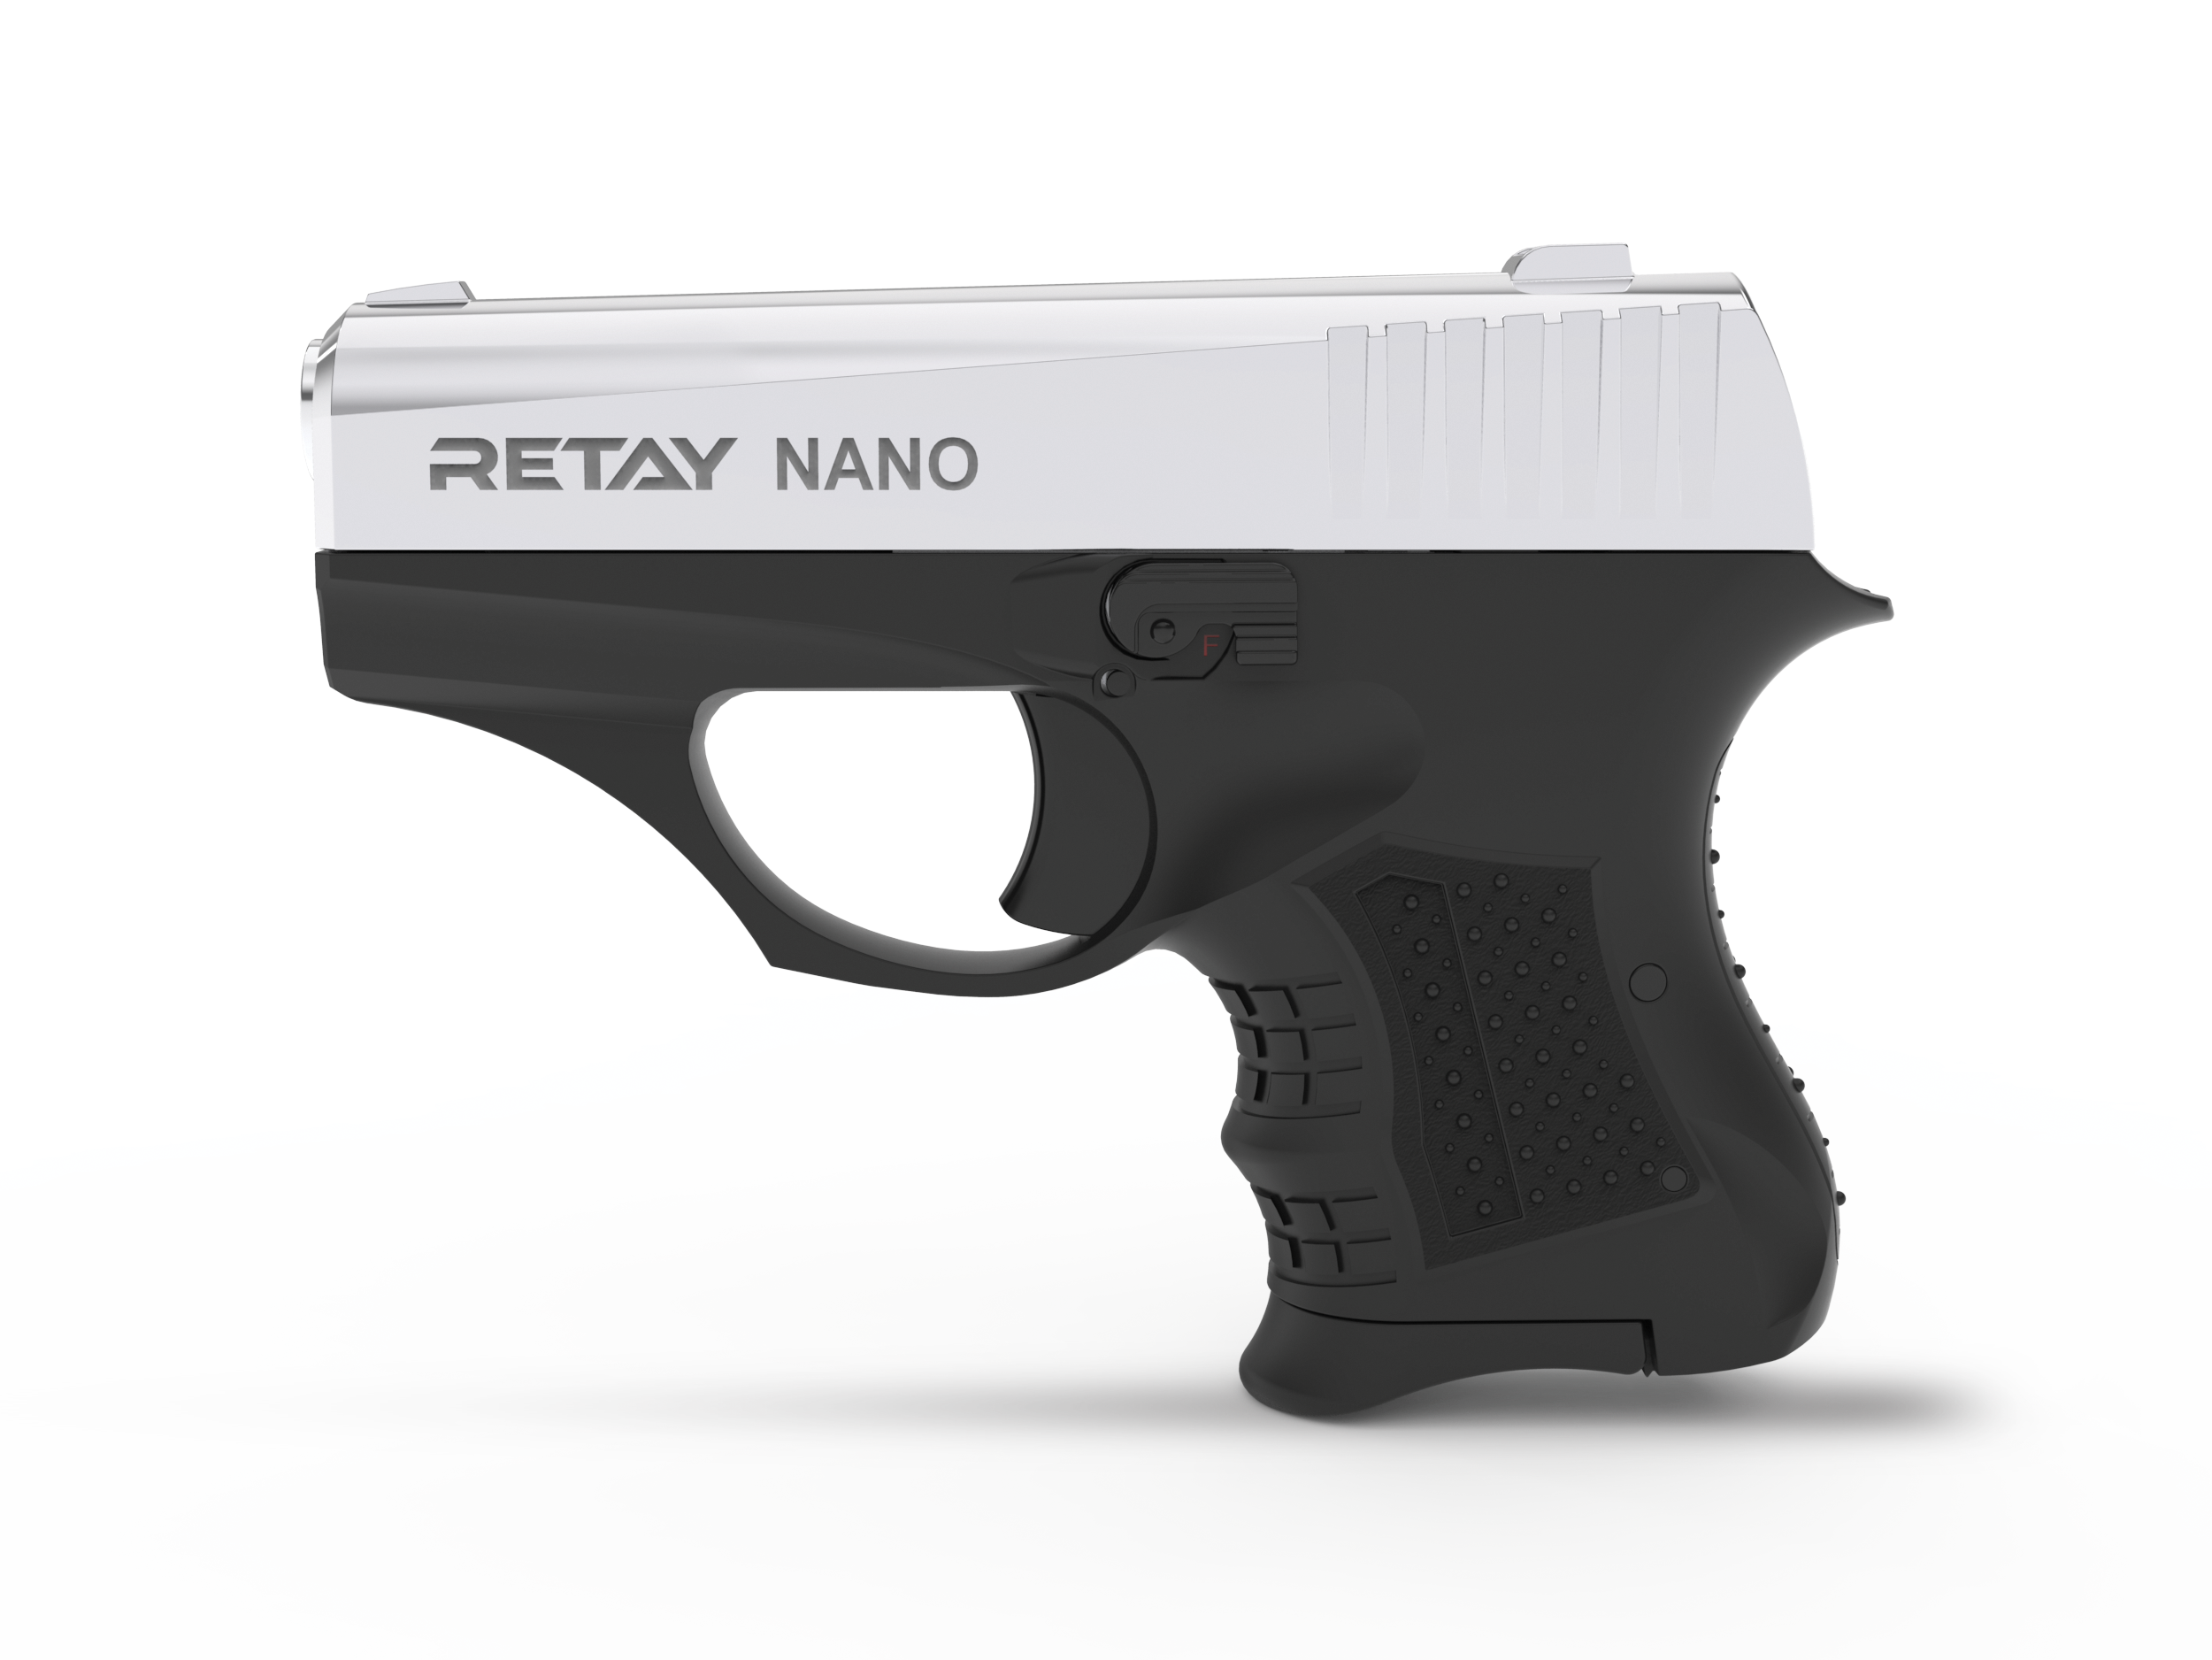 Retay nano Nickel